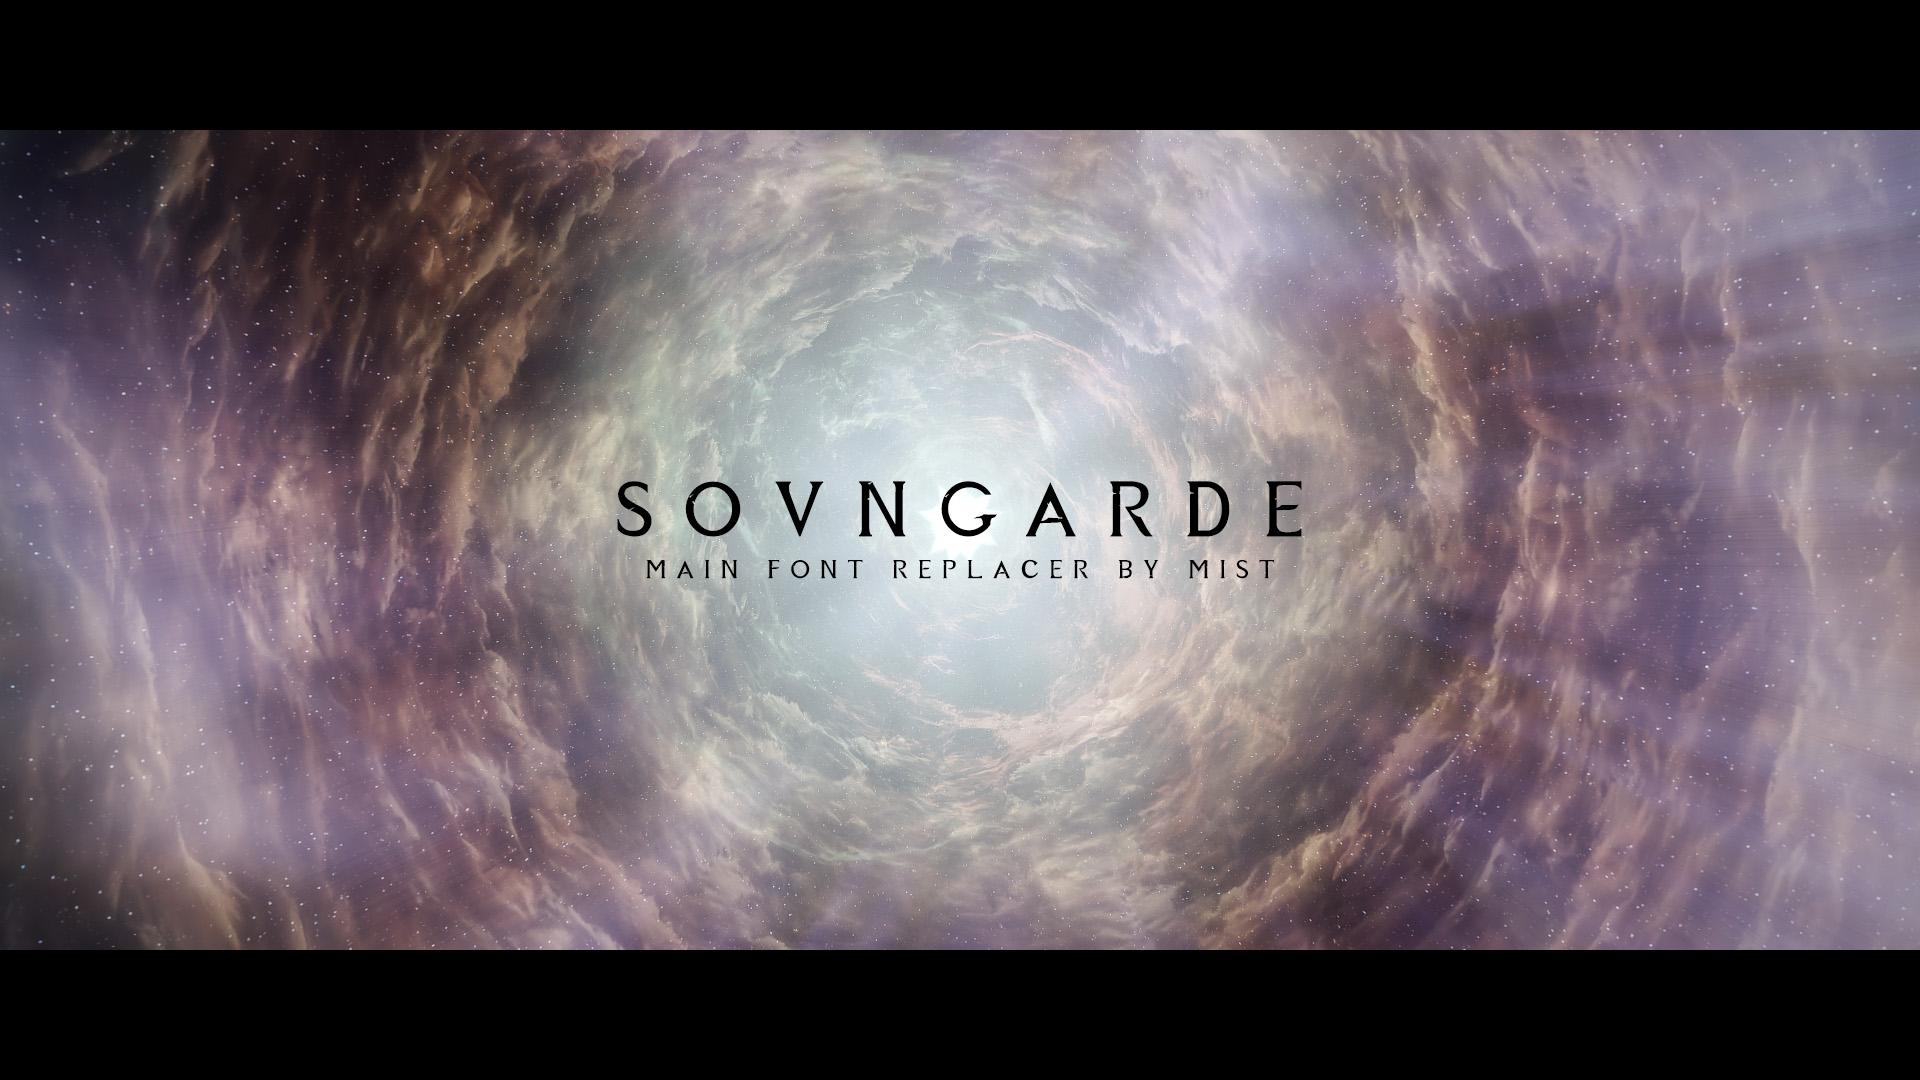 Sovngarde - Mist's Font Replacer